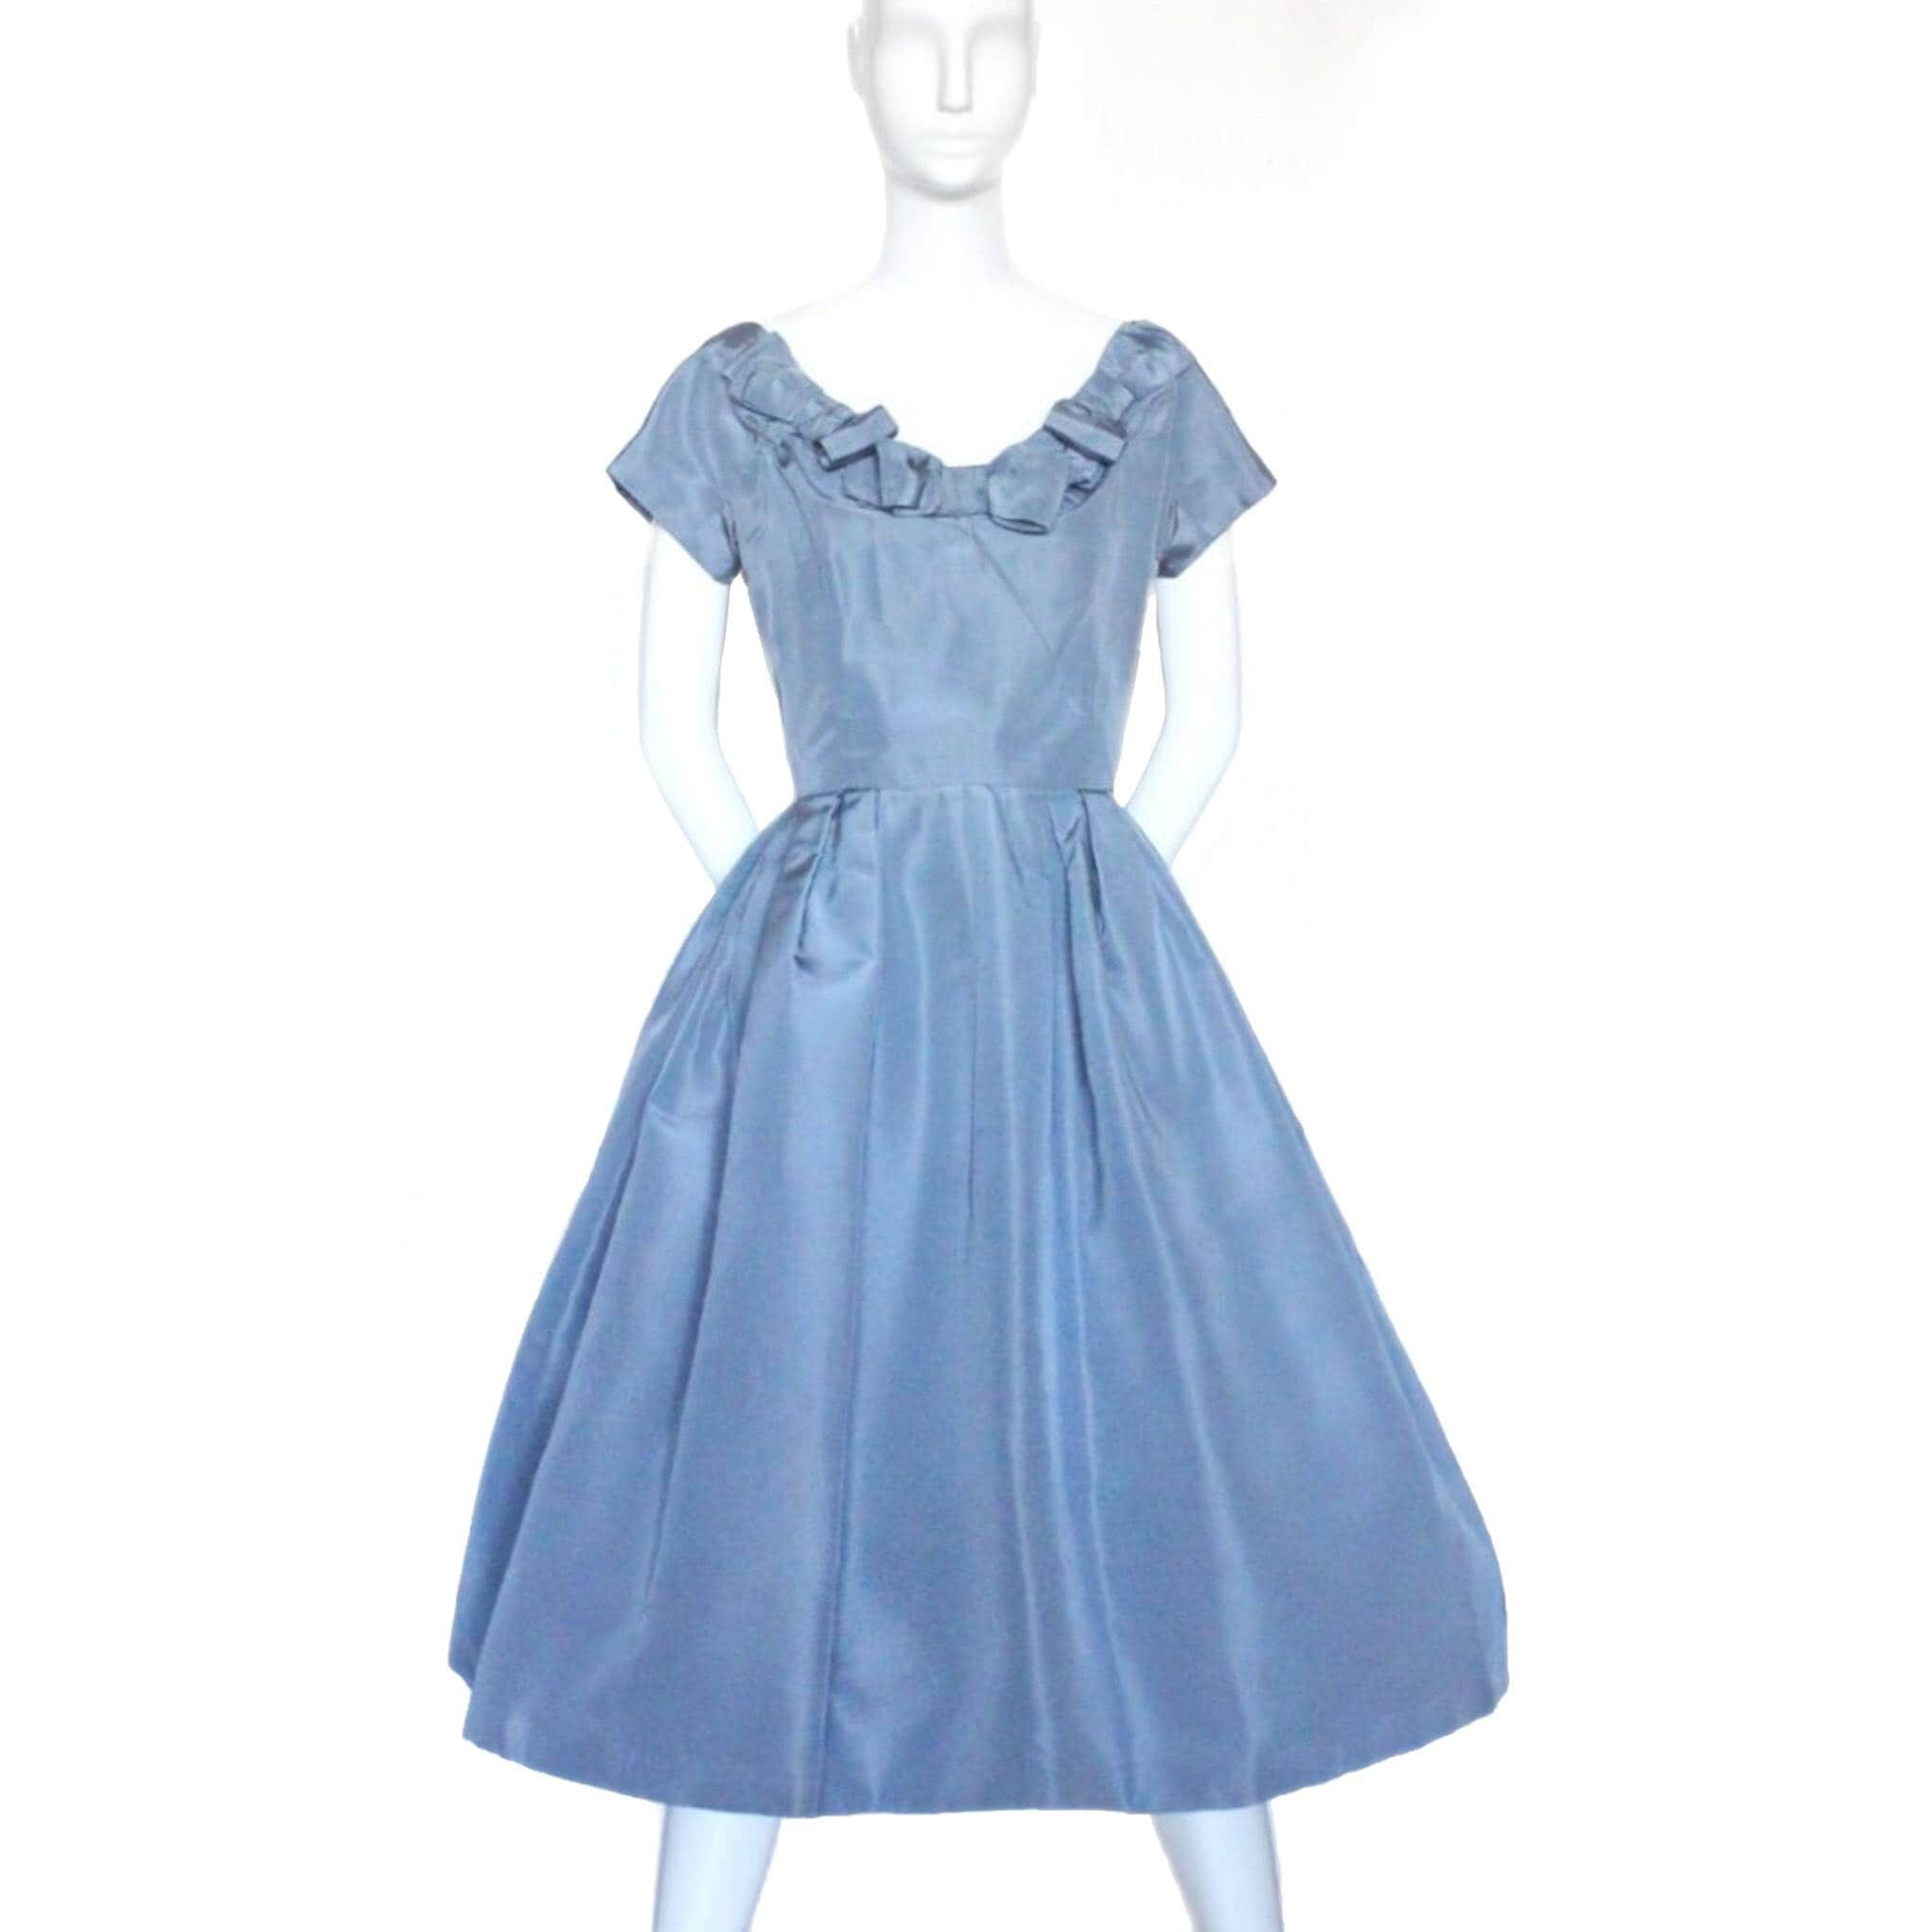 THE DREAM - authentic Christian Dior New Look-era silk faille ...